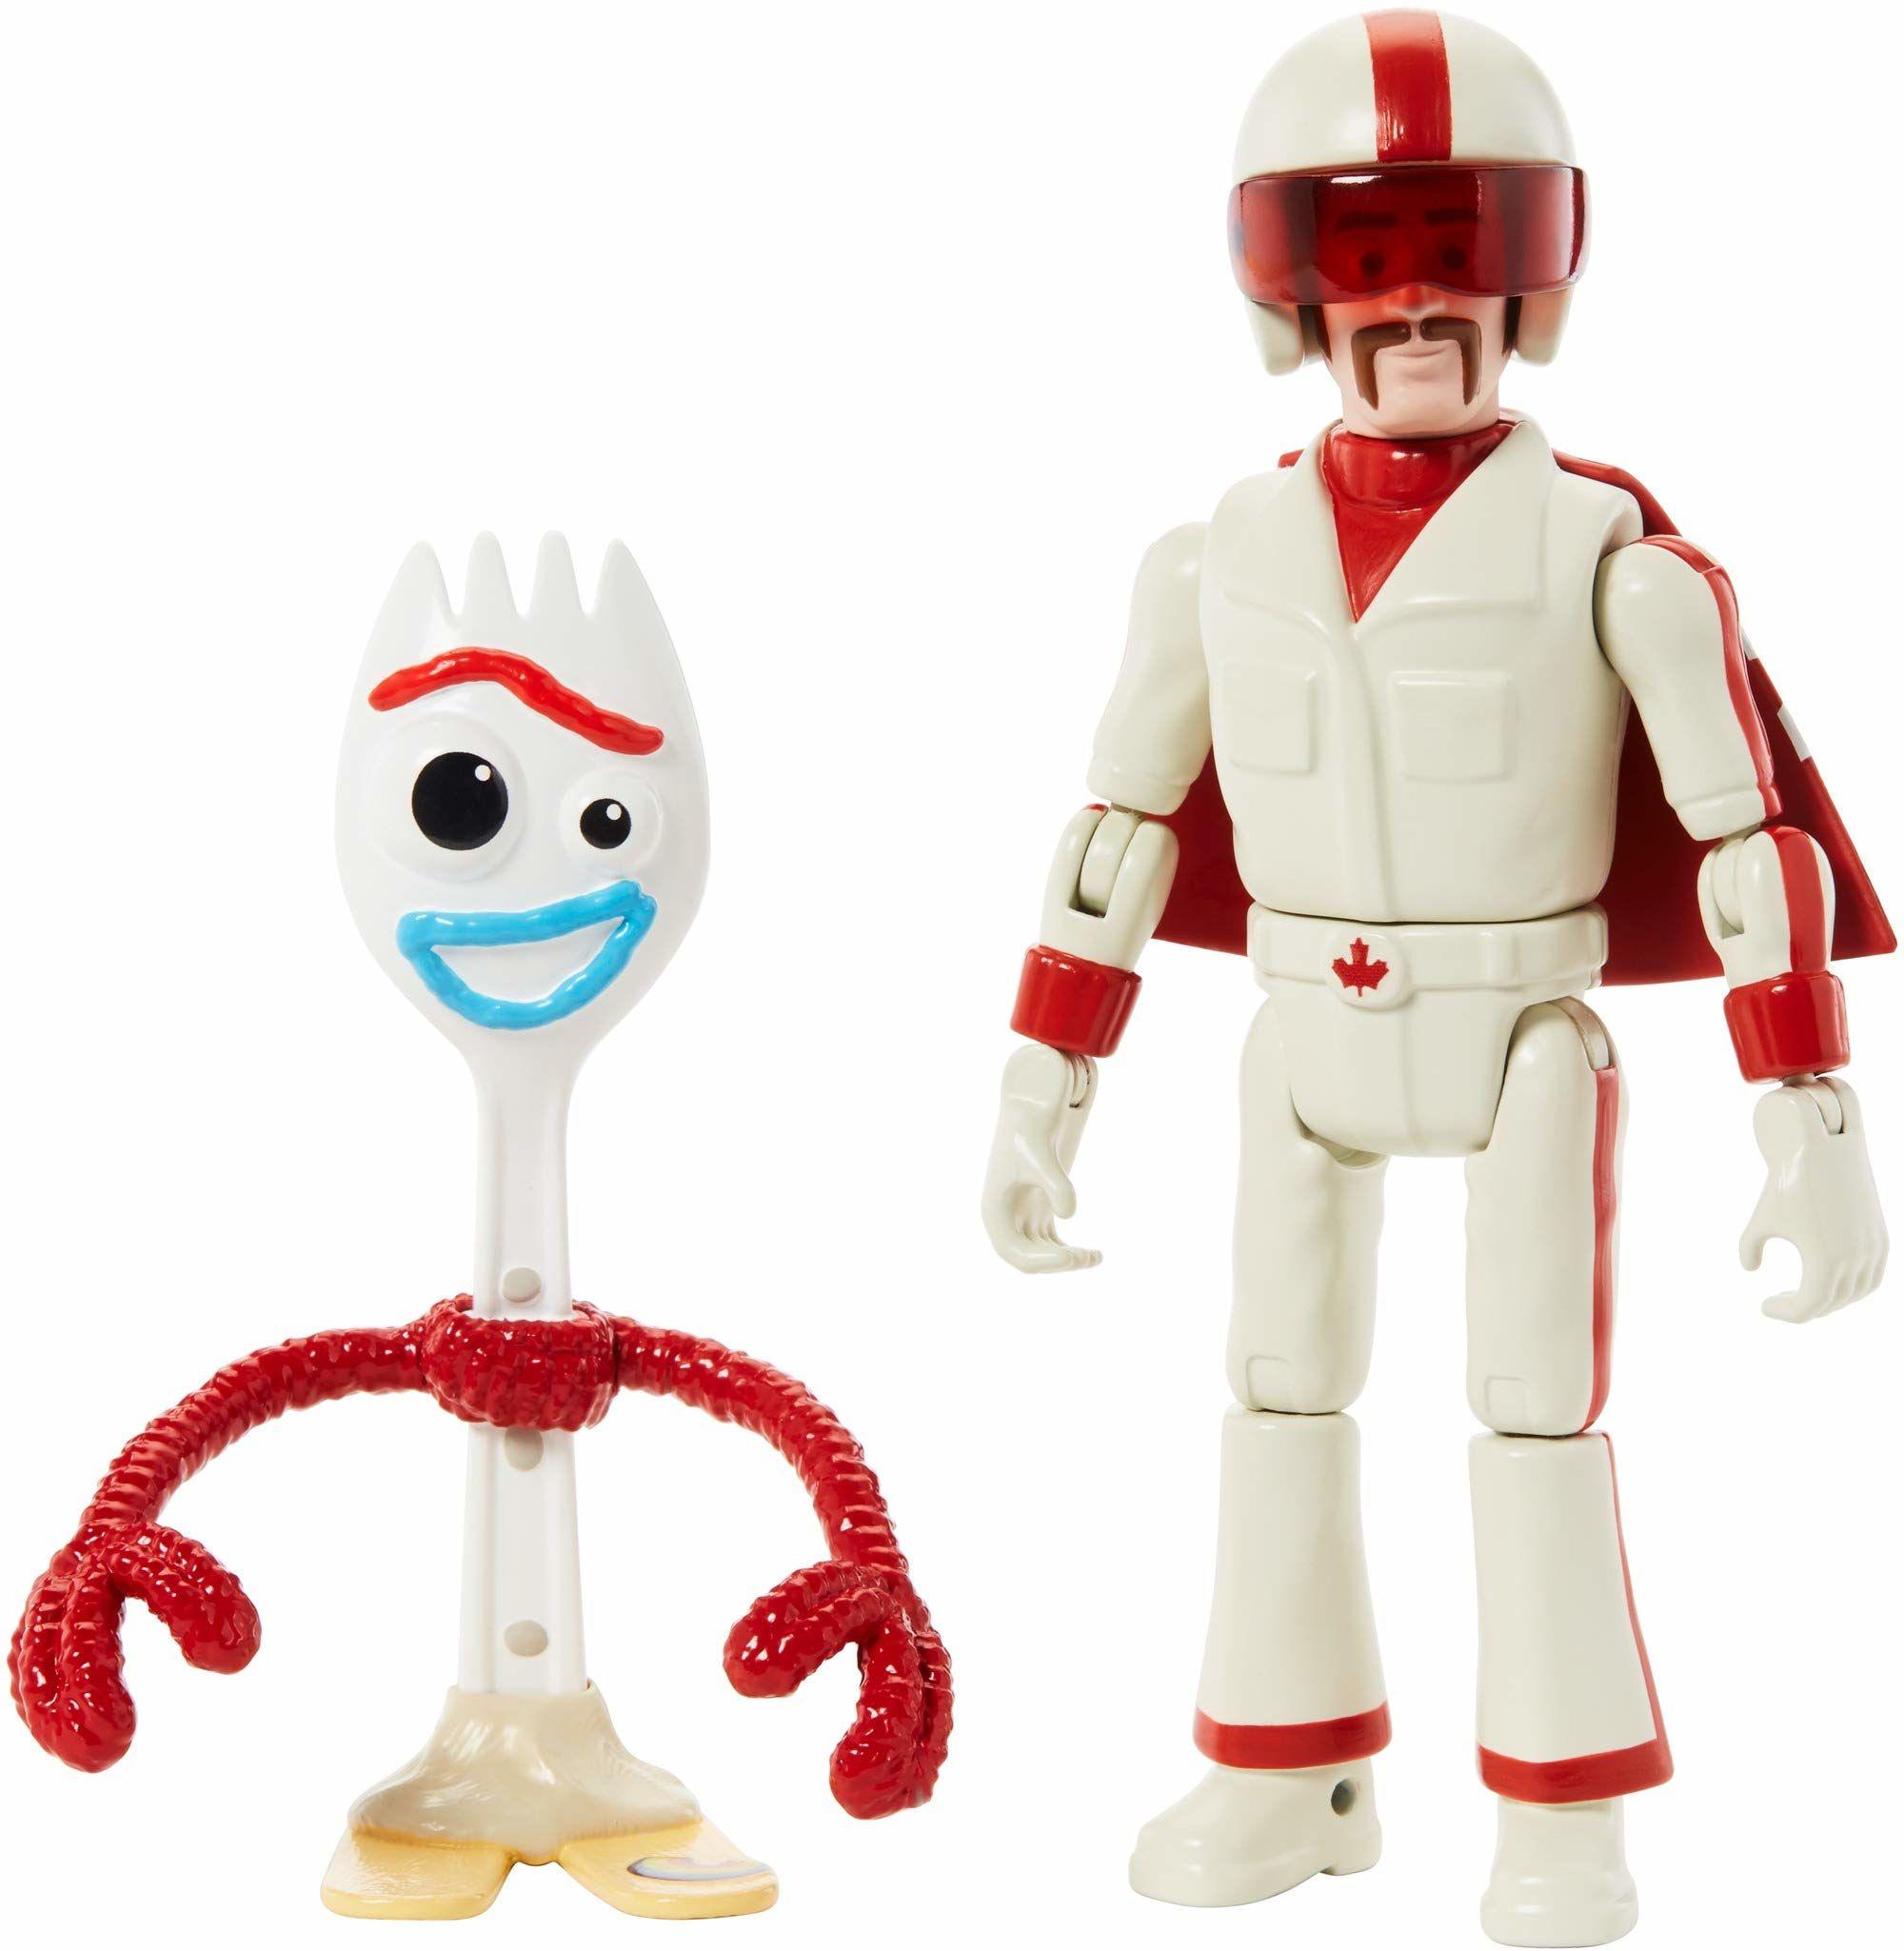 Mattel GGX29 - Disney Pixar Toy Story 4 Forky i Duke Caboom figurki akcji, zabawka od 3 lat